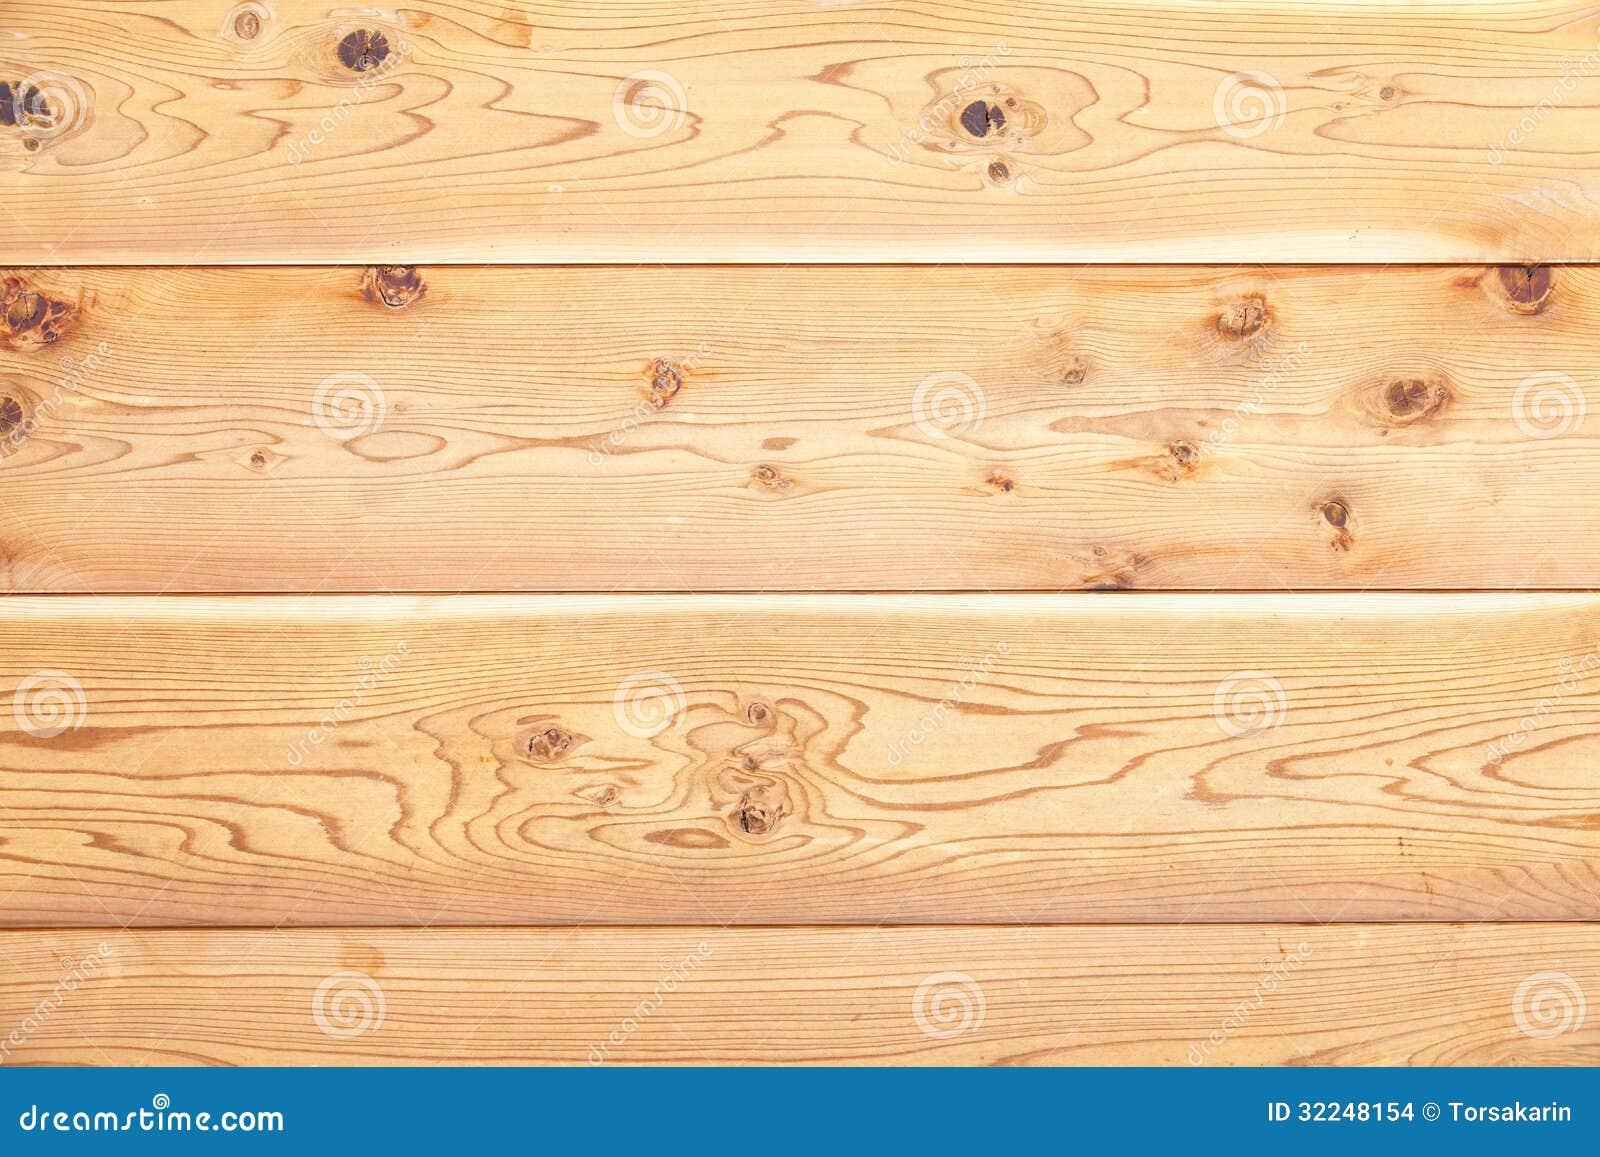 Textura de madera. fondo